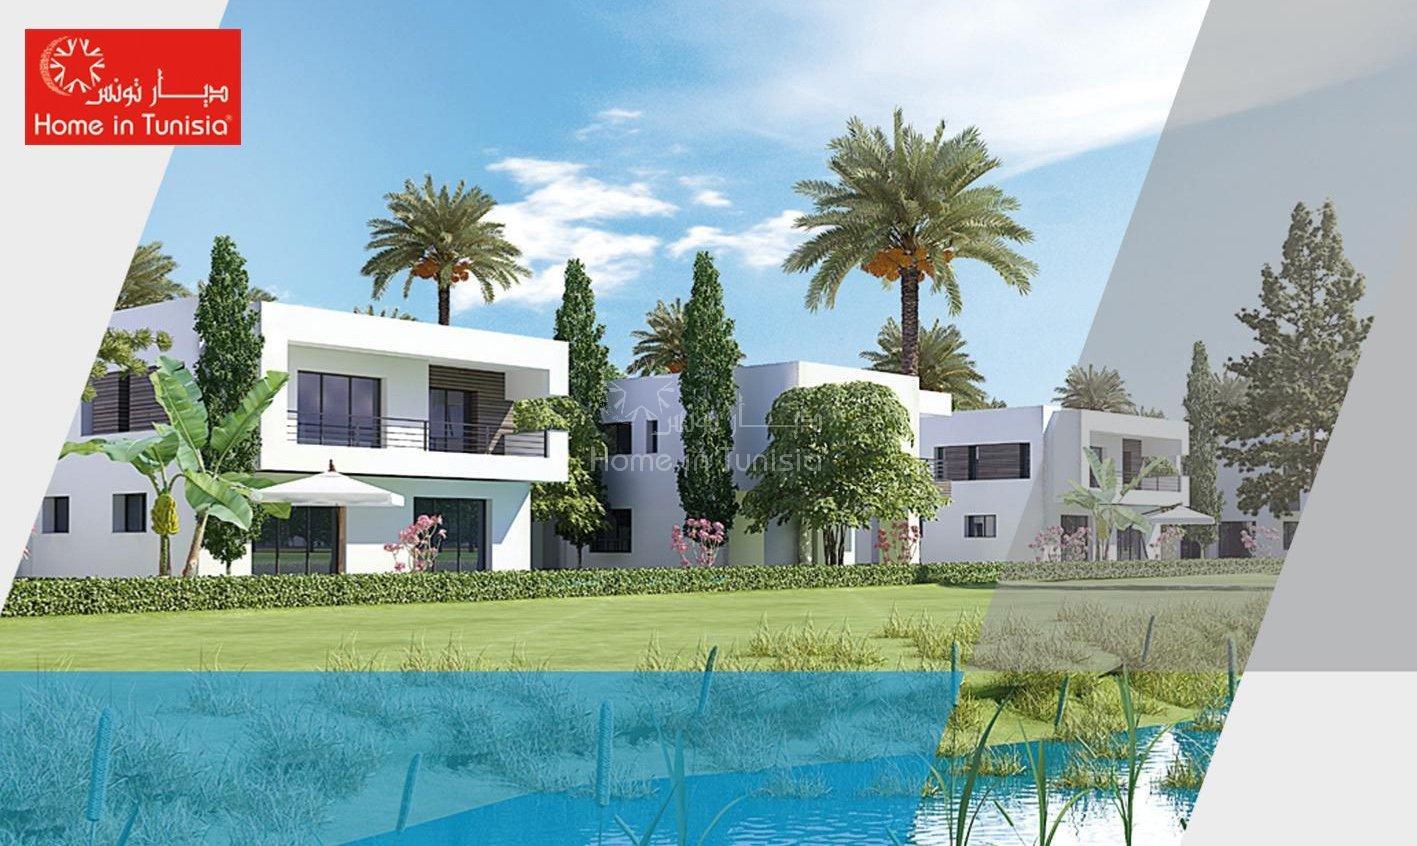 villa raoued tunesien 929 474 dt. Black Bedroom Furniture Sets. Home Design Ideas